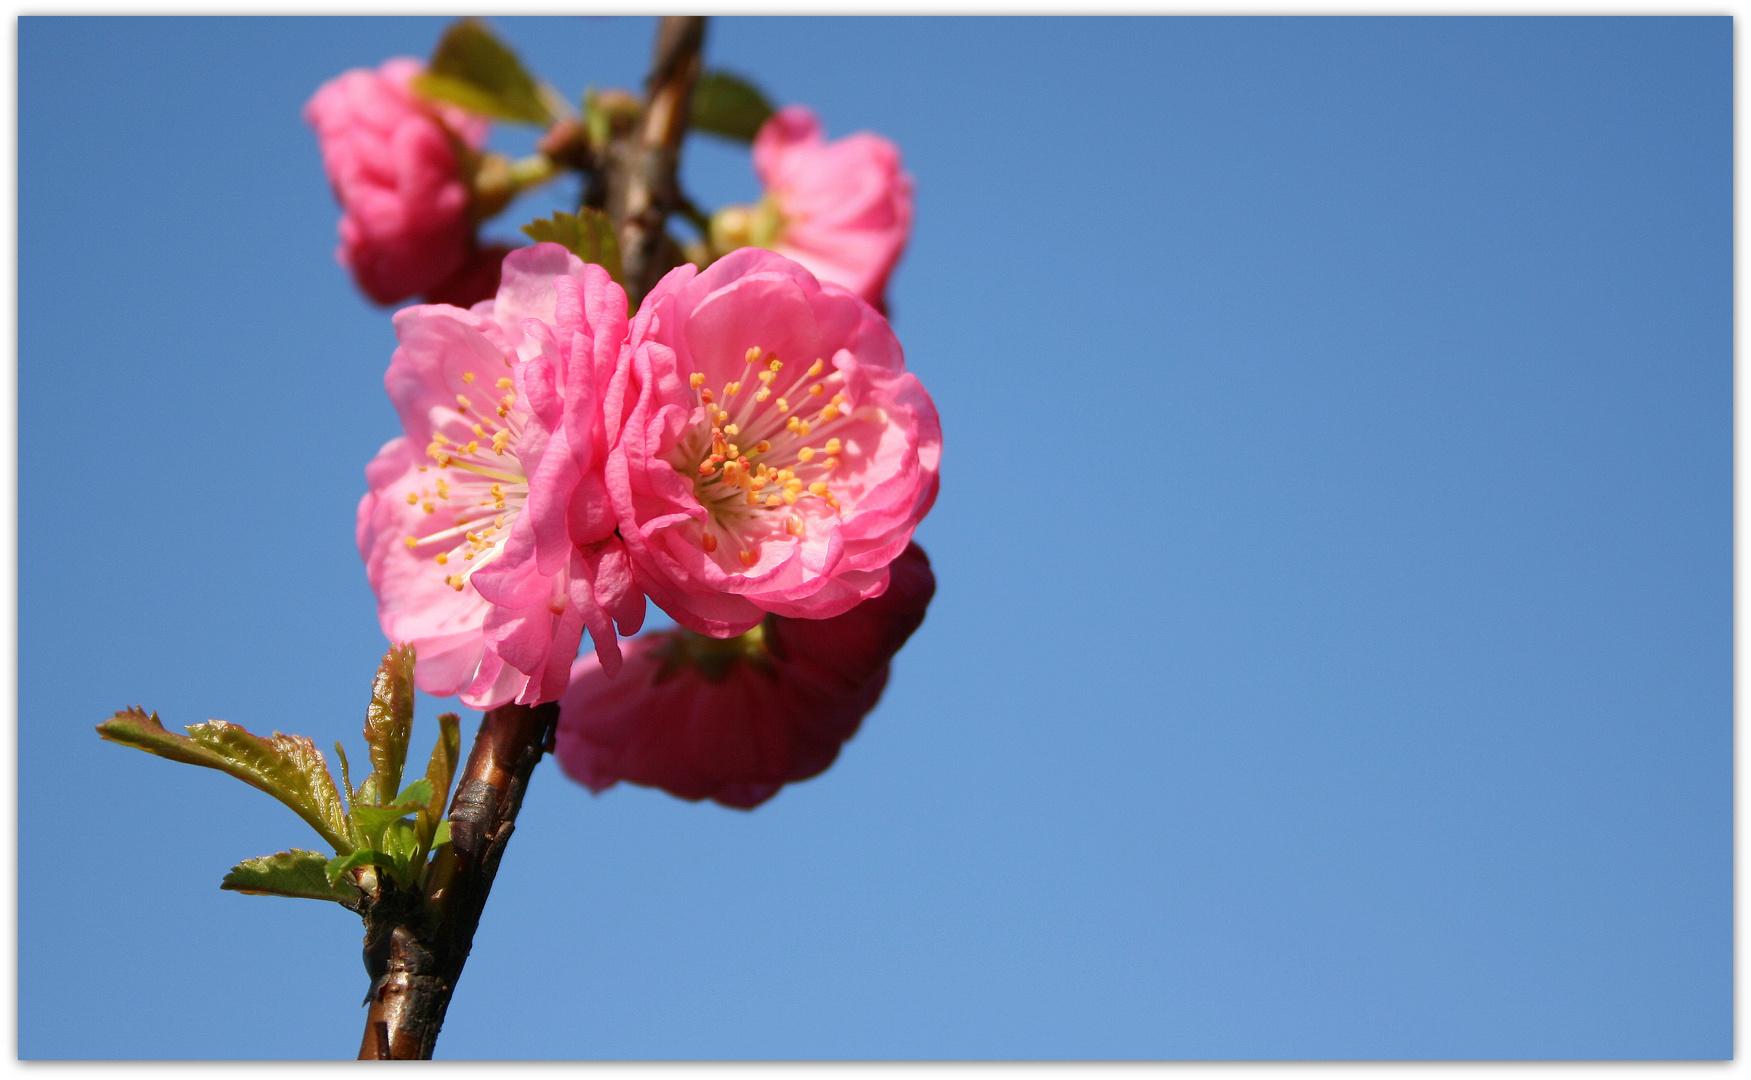 rosa und himmelblau ...